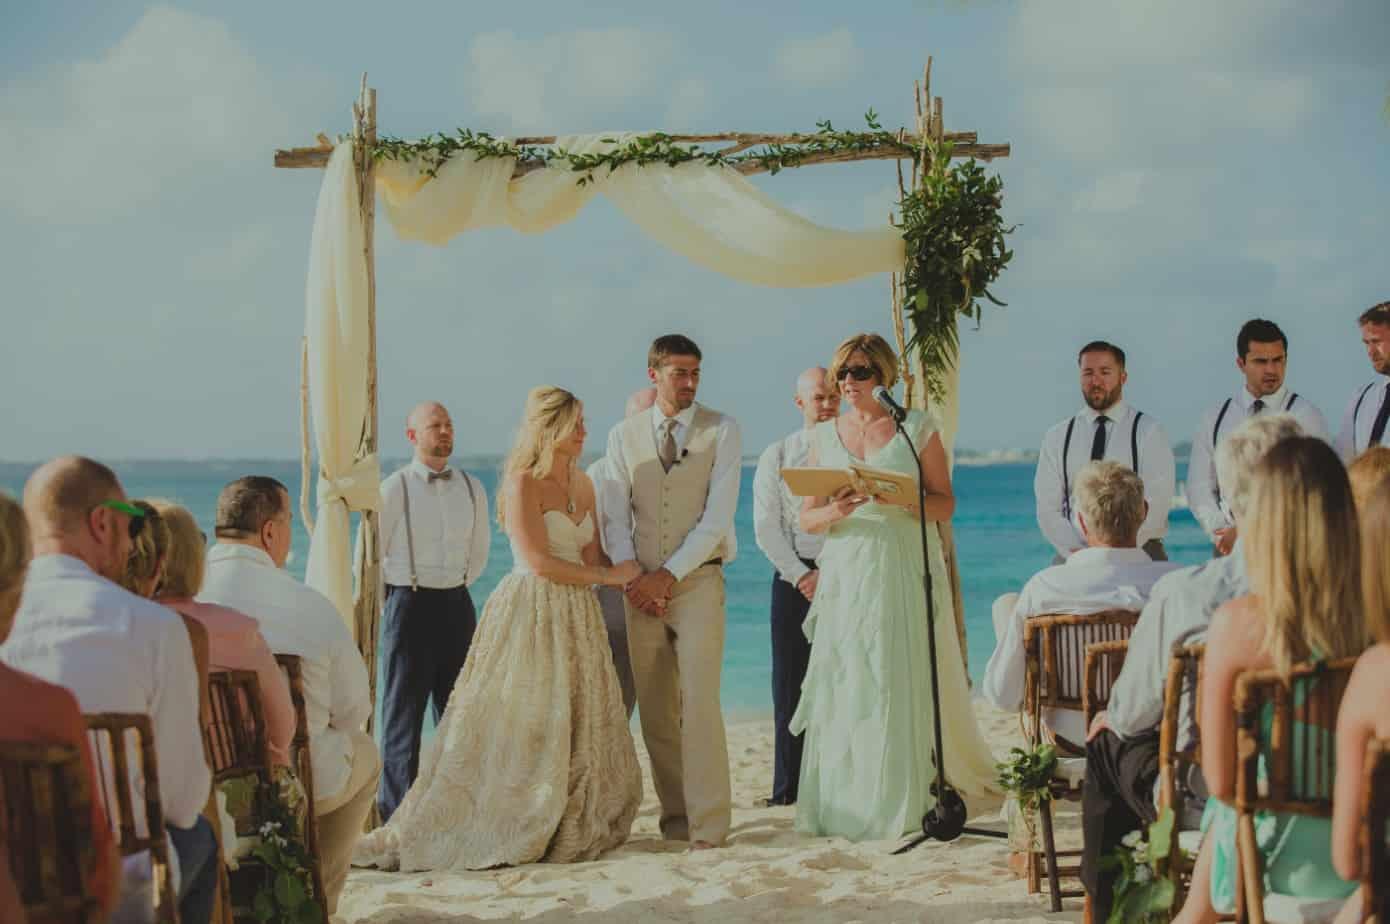 wedding-ceremony-bridesmaids-celebrations-ltd-cayman-islands-destination-wedding-4